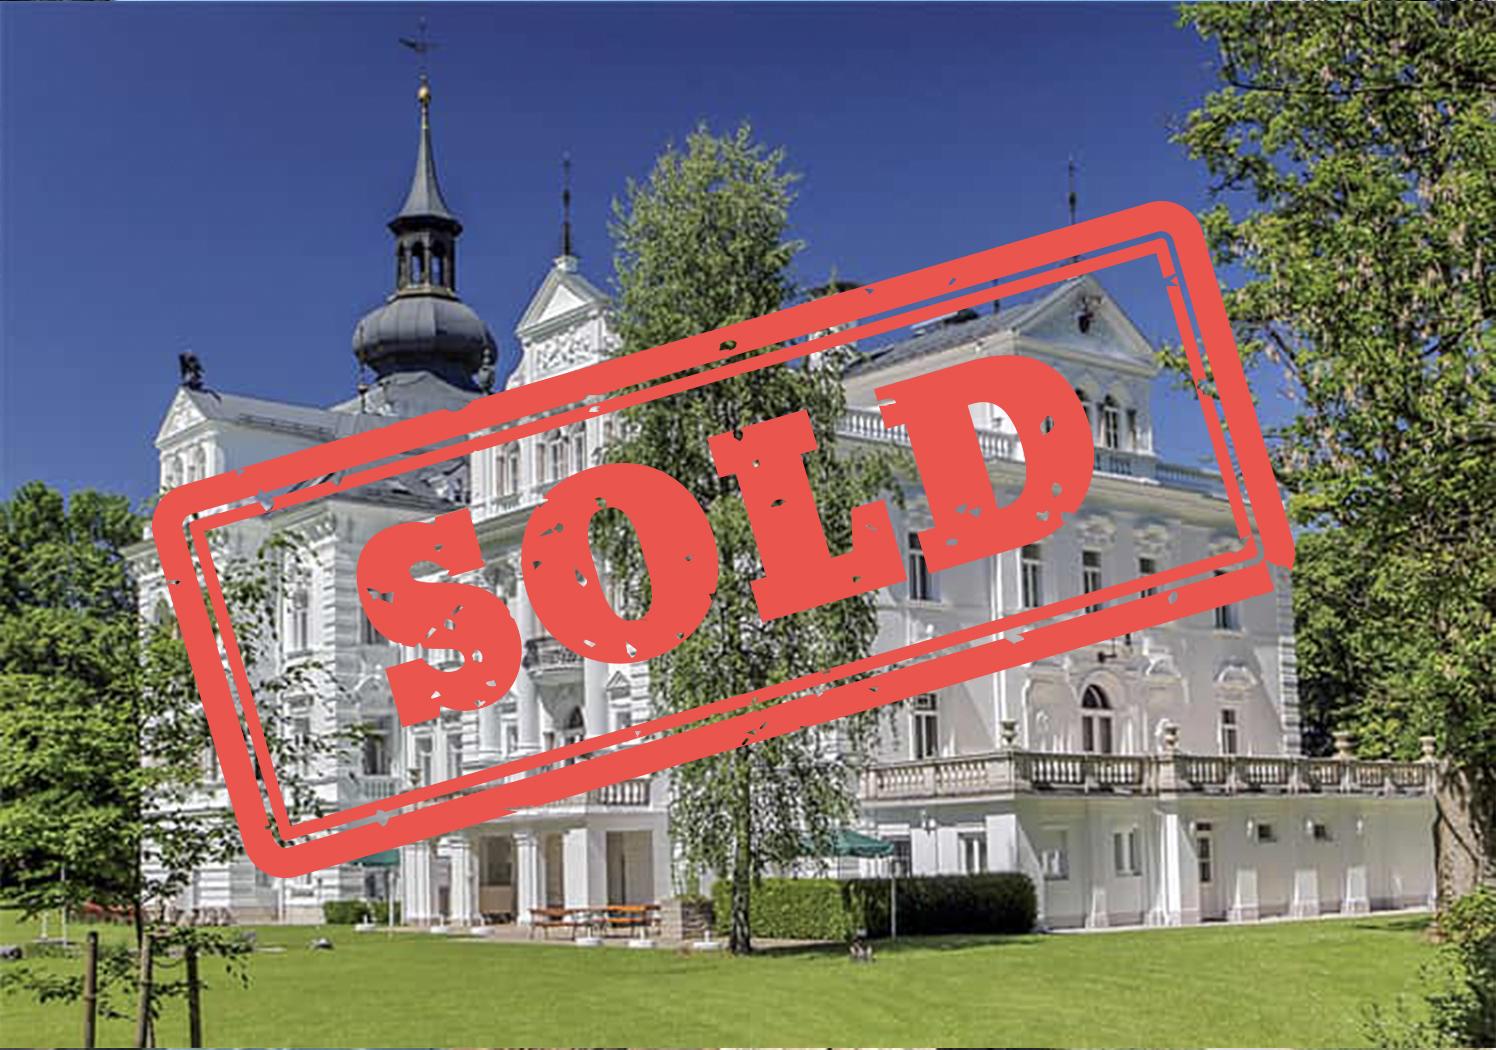 Giesinger Garten Einzigartig for Sale Dream Castle In Excellent Condition